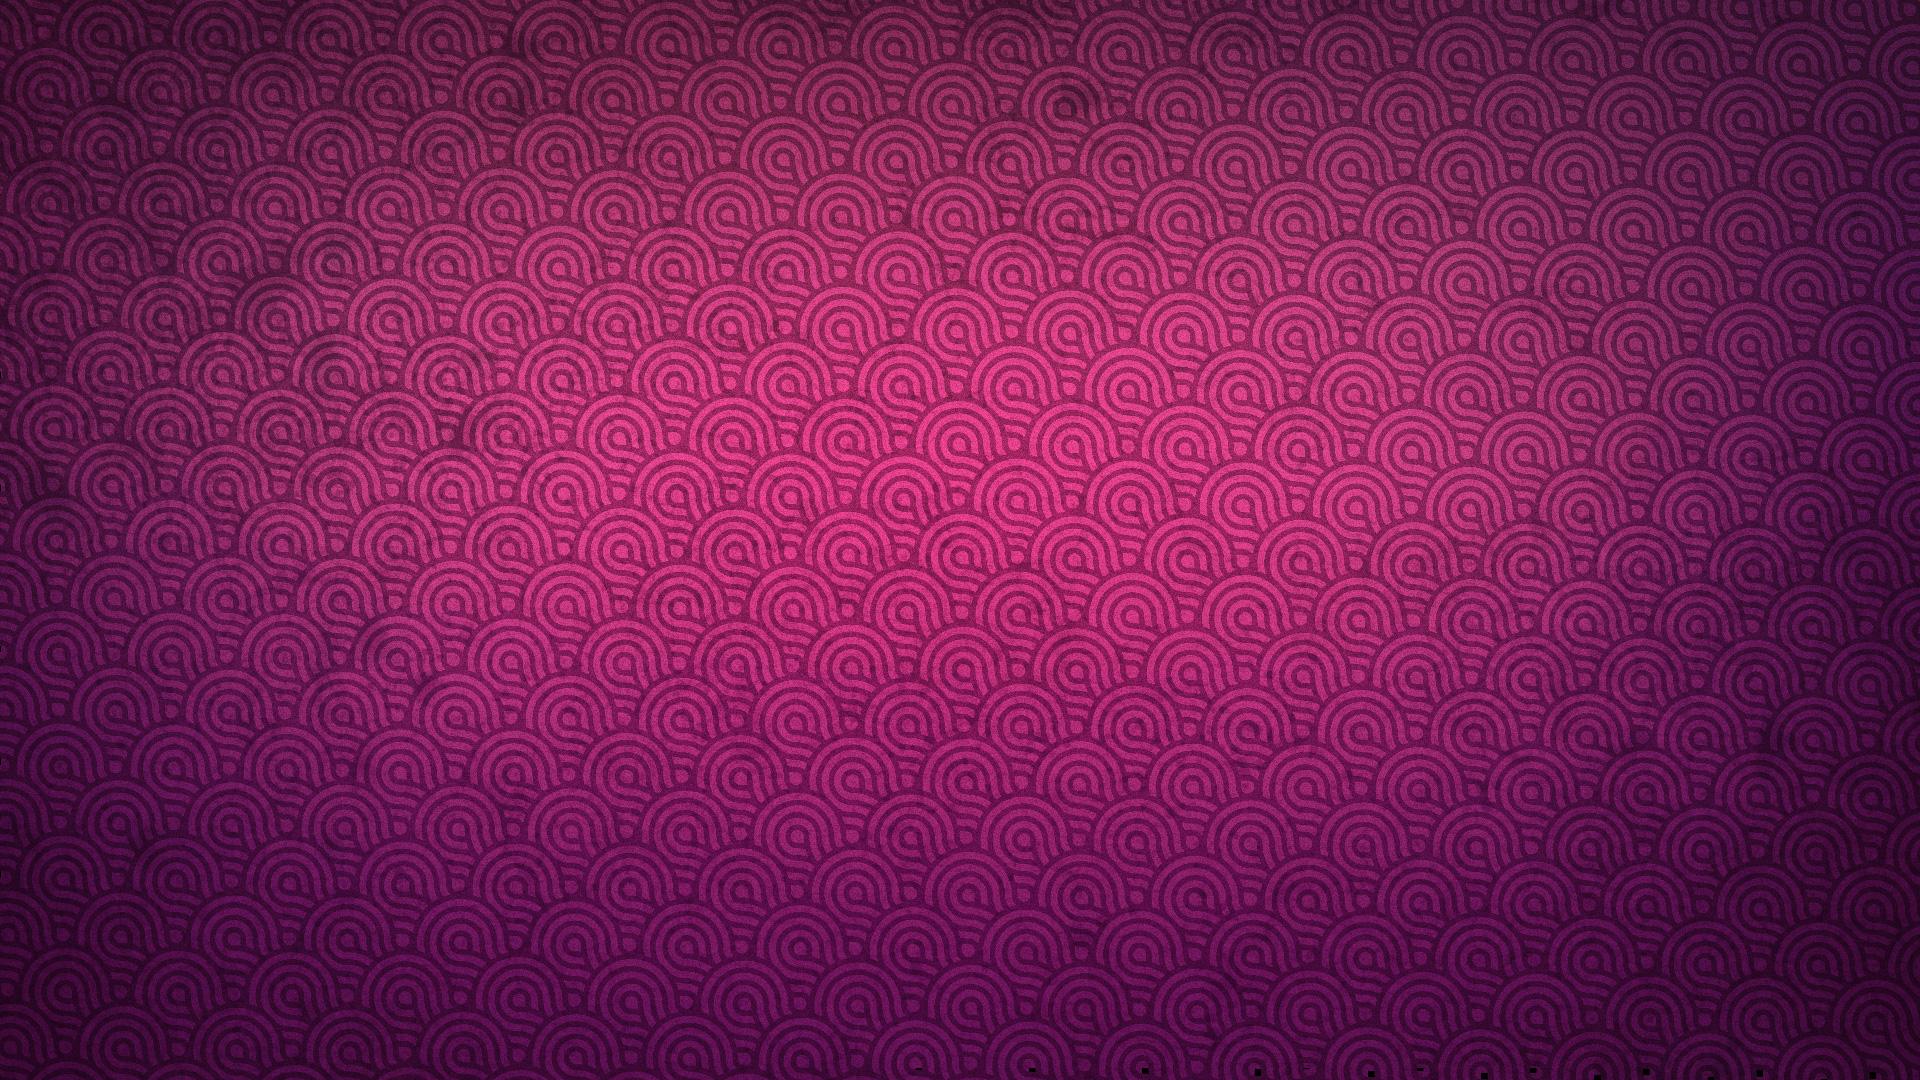 Elegant_Background-11